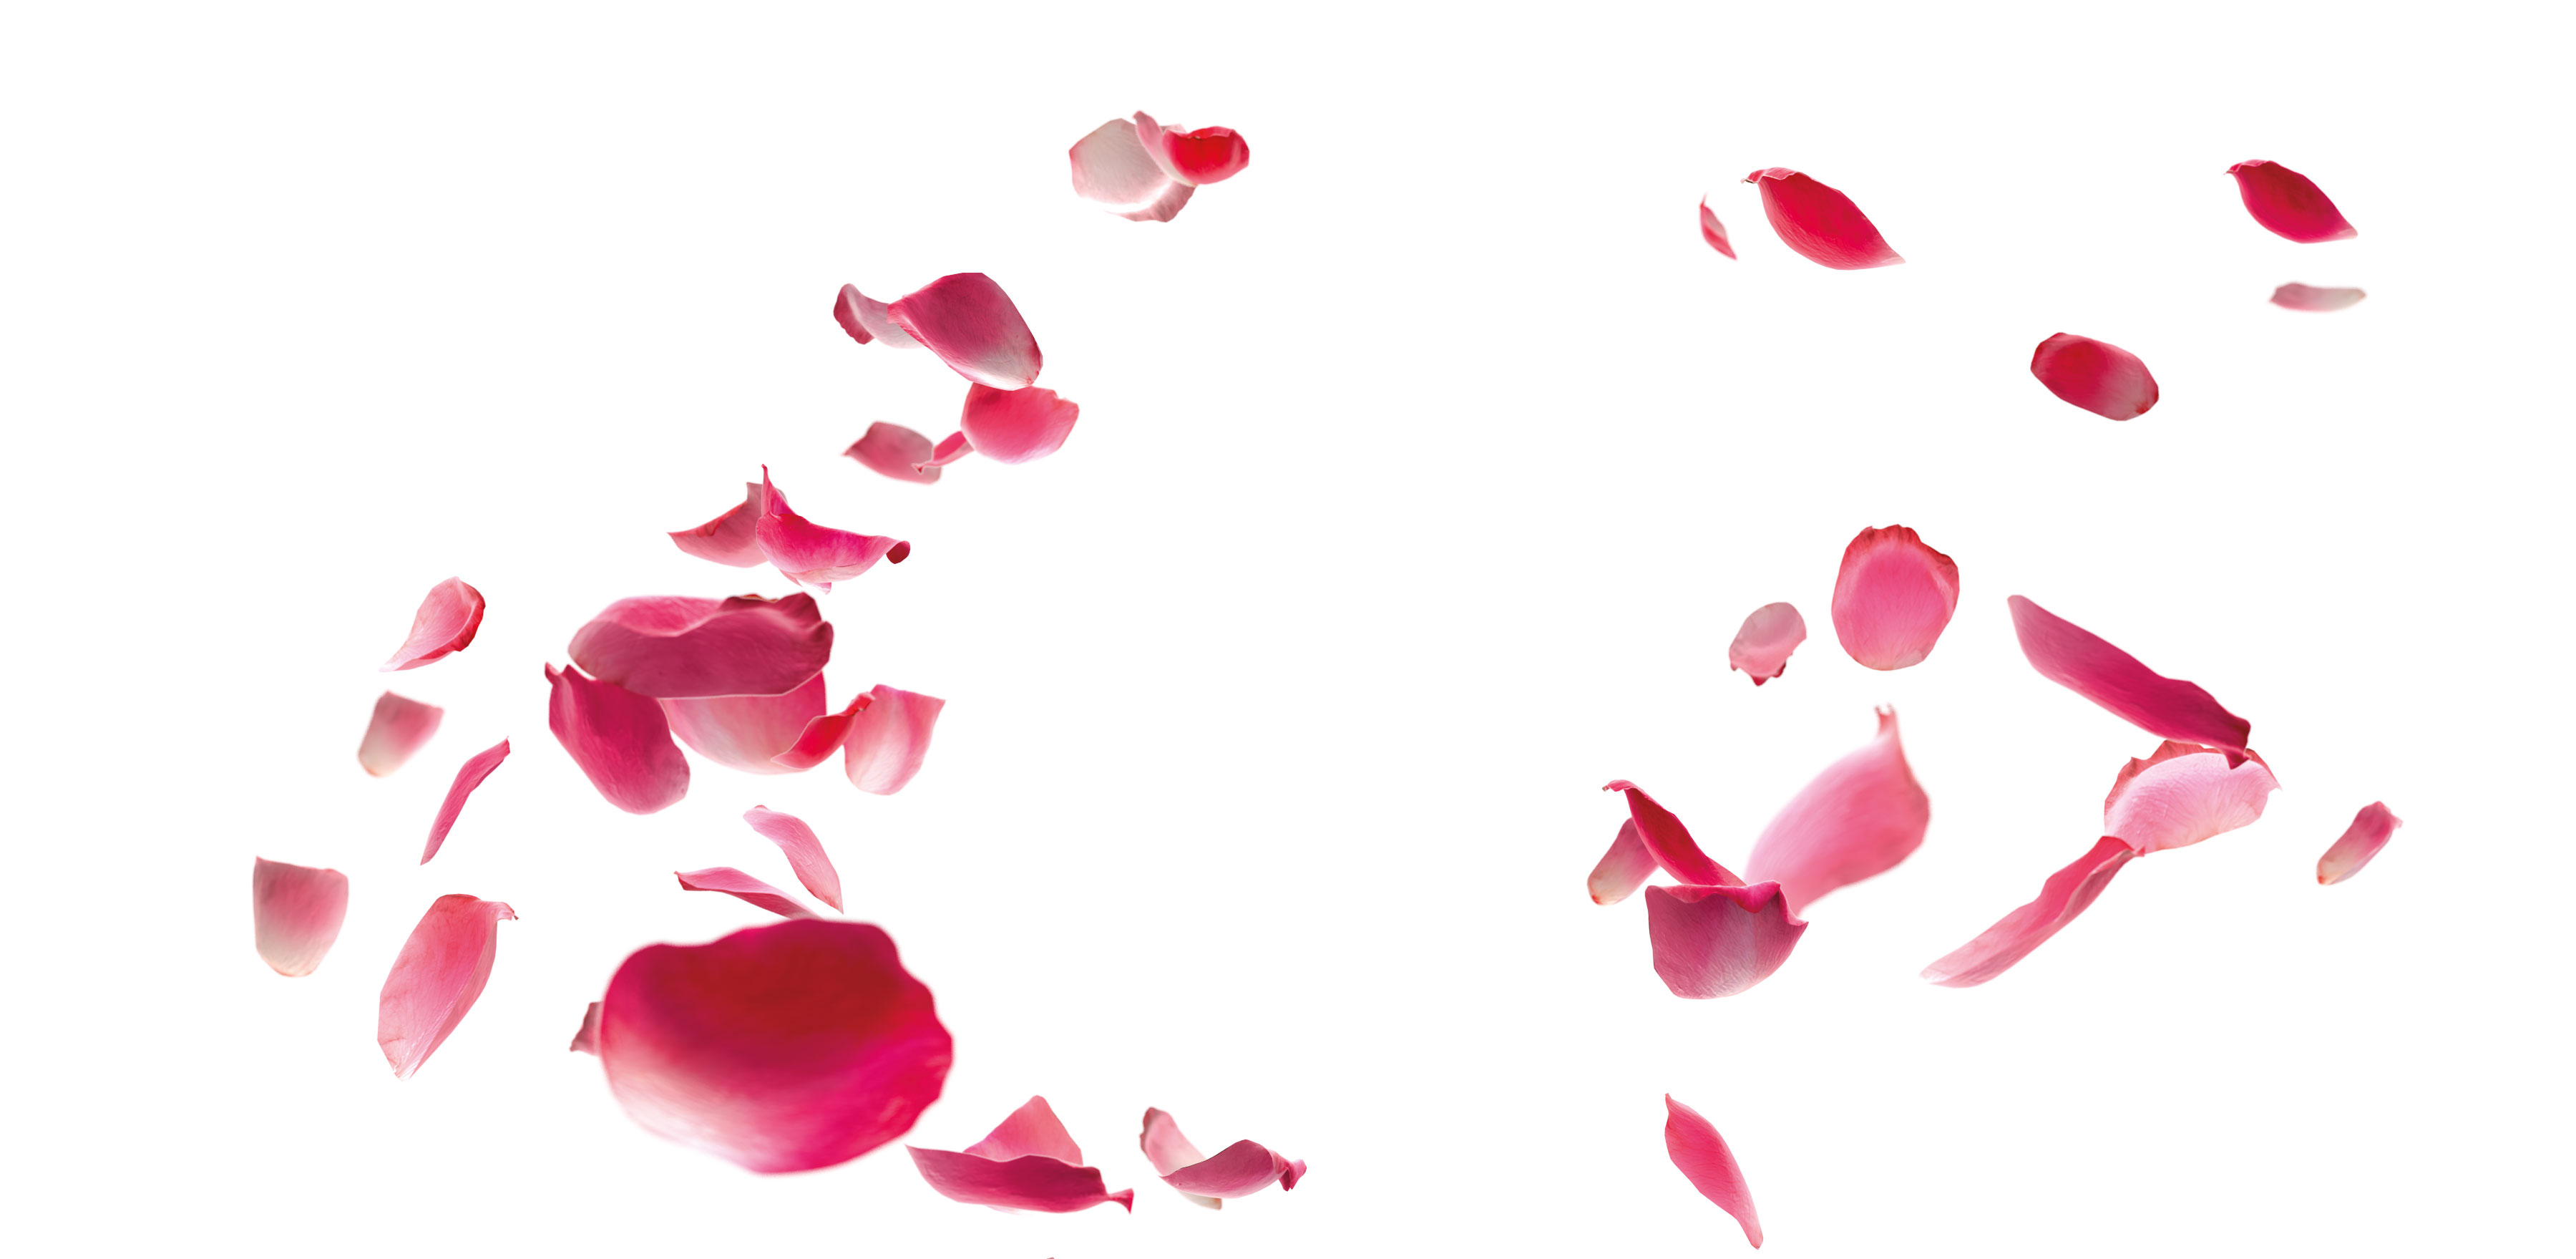 Rosenbl-tter-pink